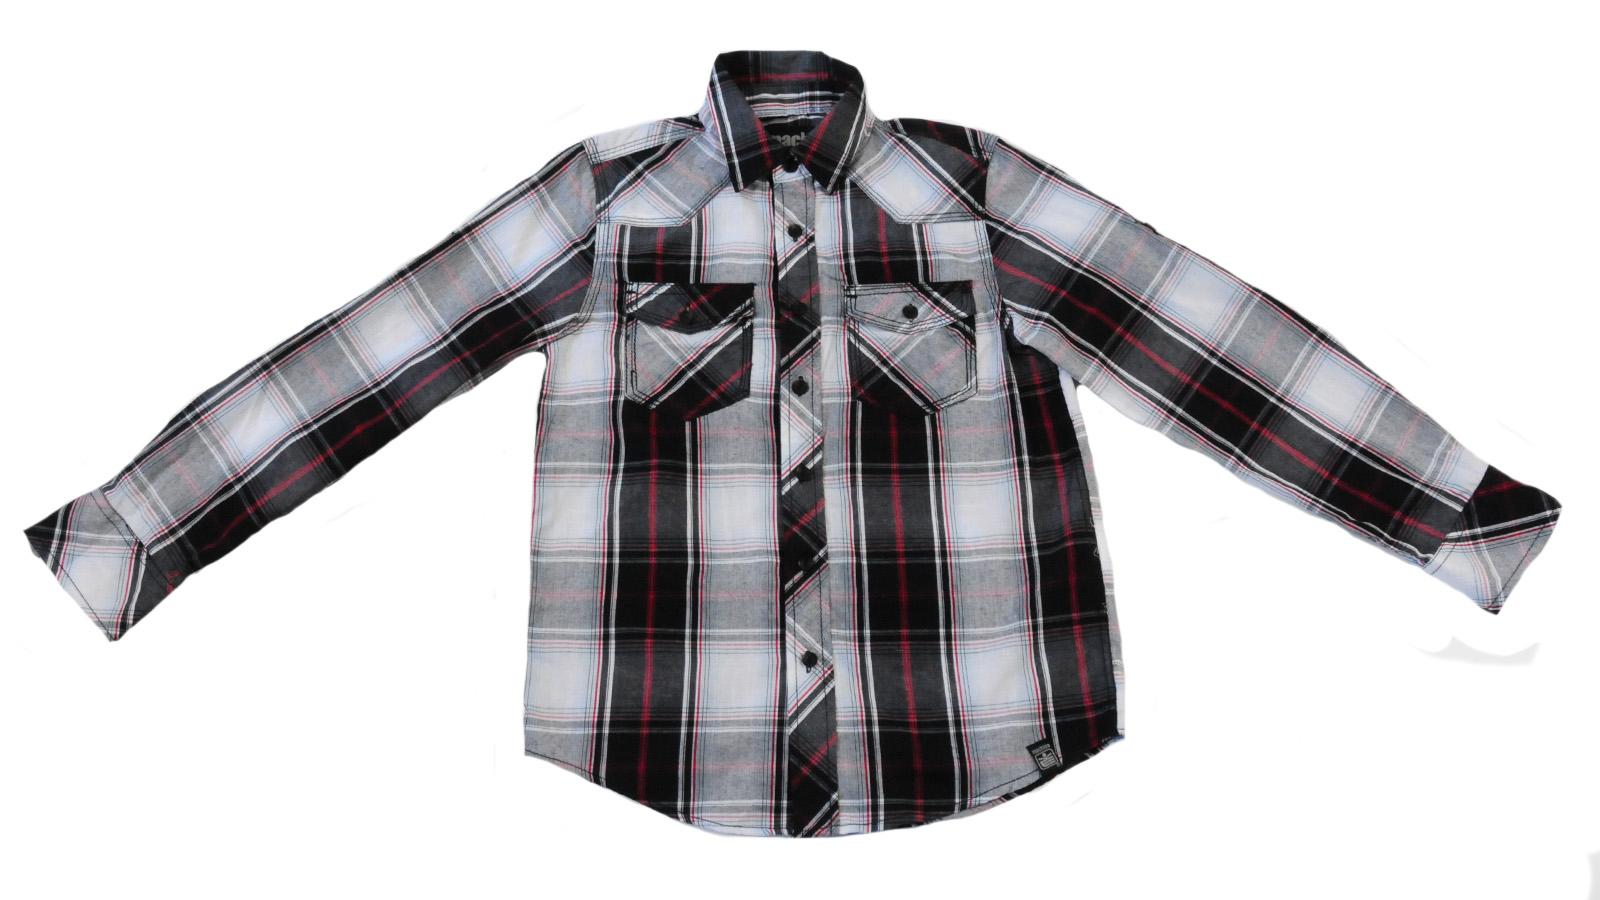 Рубашка клетчатая от Kity для мальчиков вид спереди